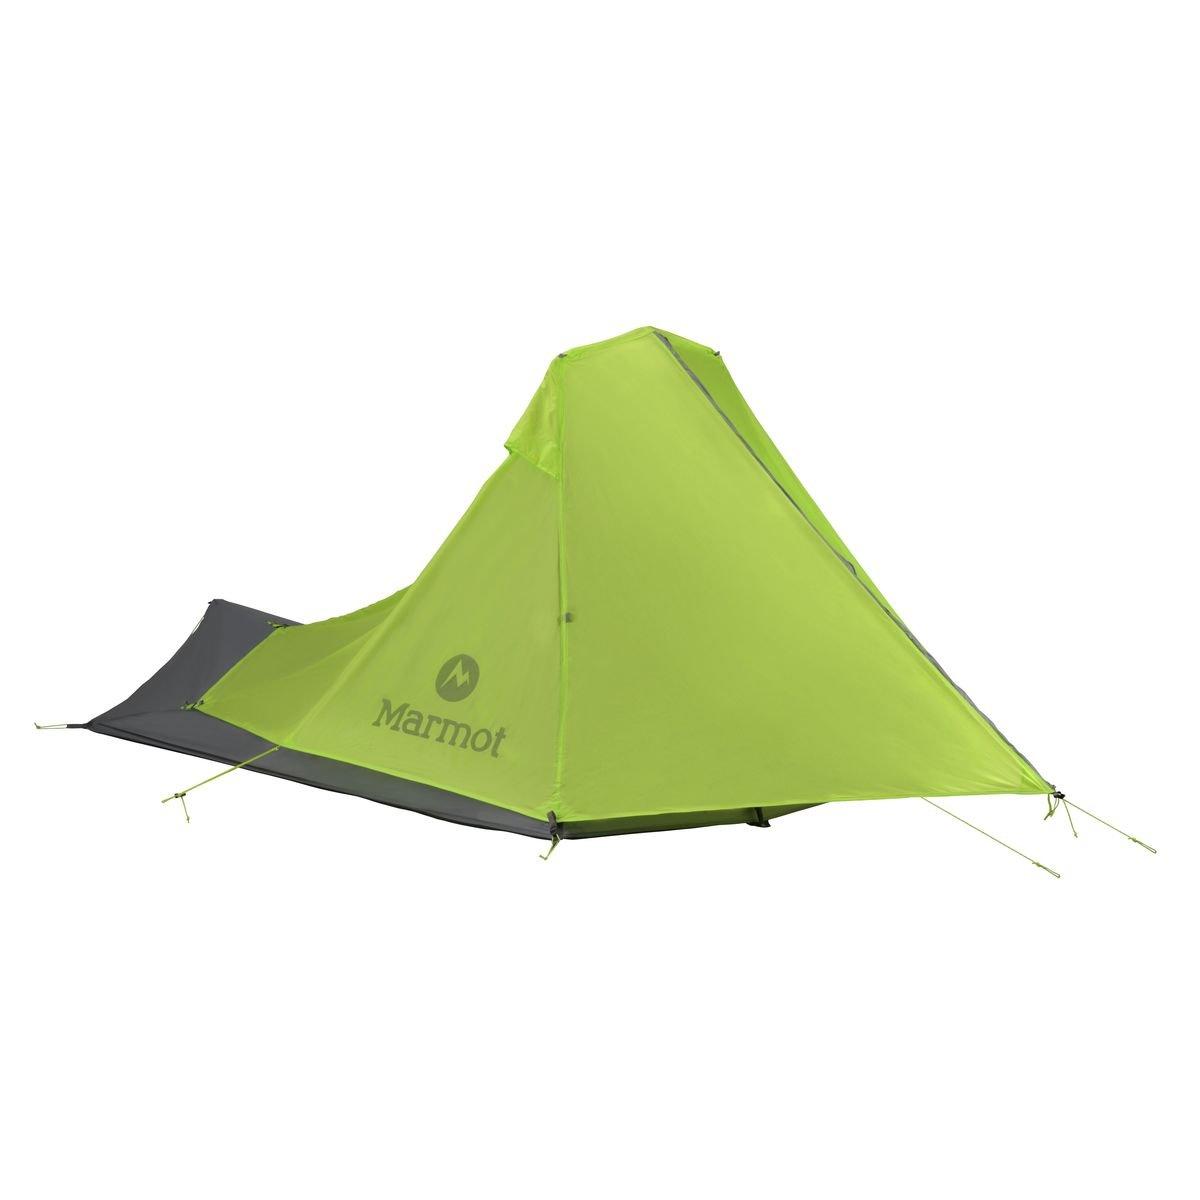 Marmot Nitro 2p Tent: 2 Person 3 Season Green Lime/Steel, One Size by Marmot   B00M85WVDO